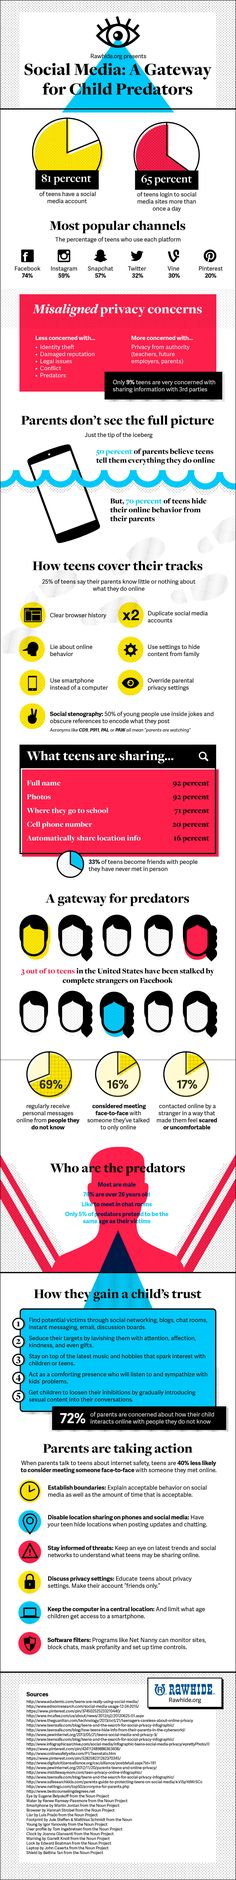 Facebook, Instagram, Snapchat, Twitter, Pinterest: A Gateway for Child Predators - #infographic